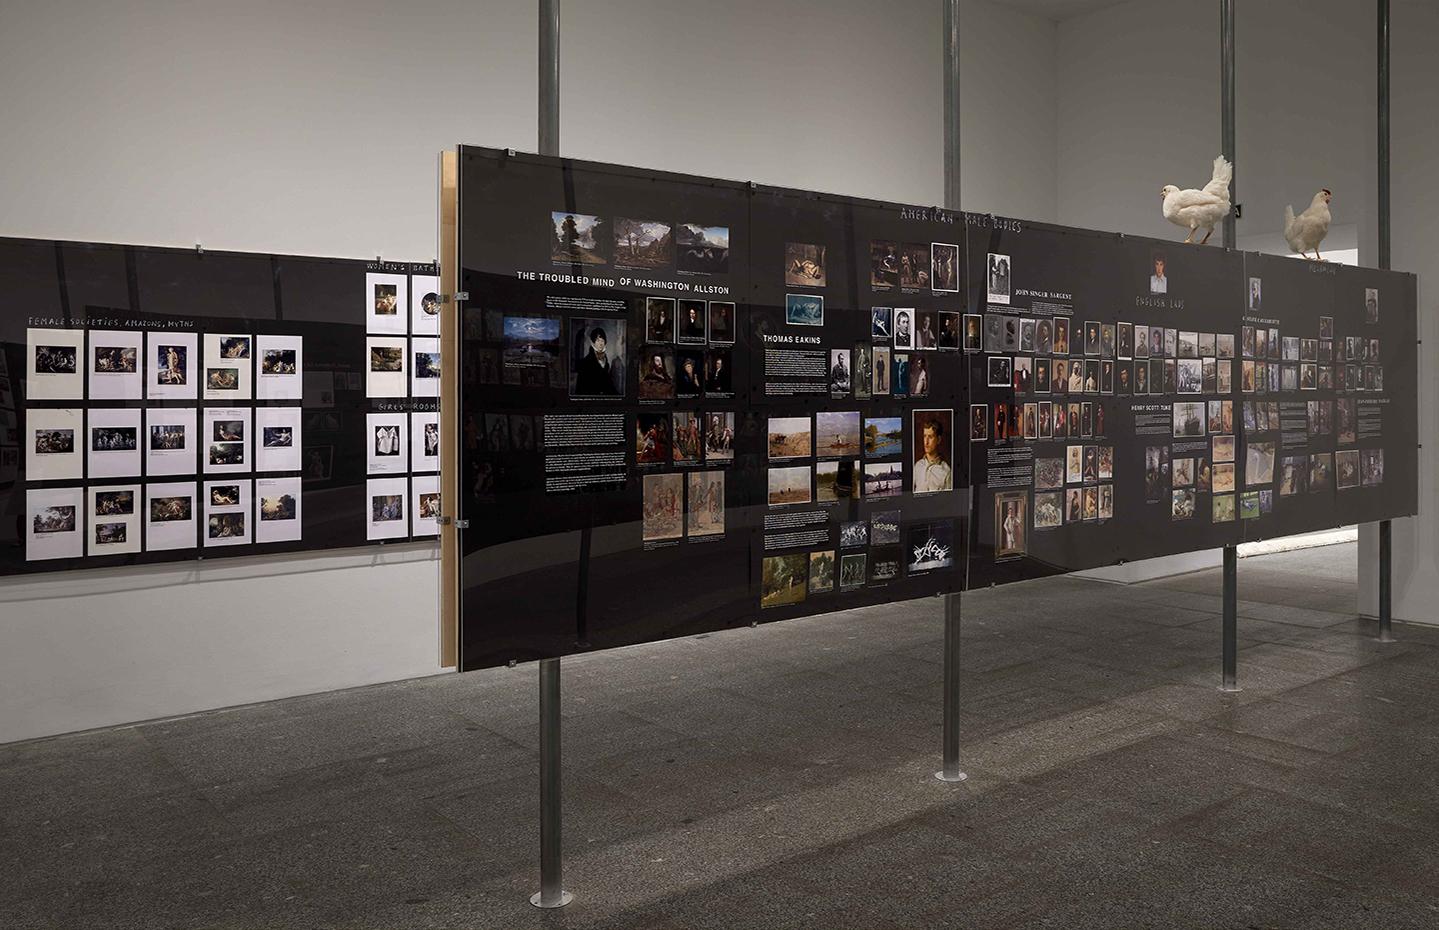 Studio La Sala Milano no windows but doors: henrik olesen •mousse magazine